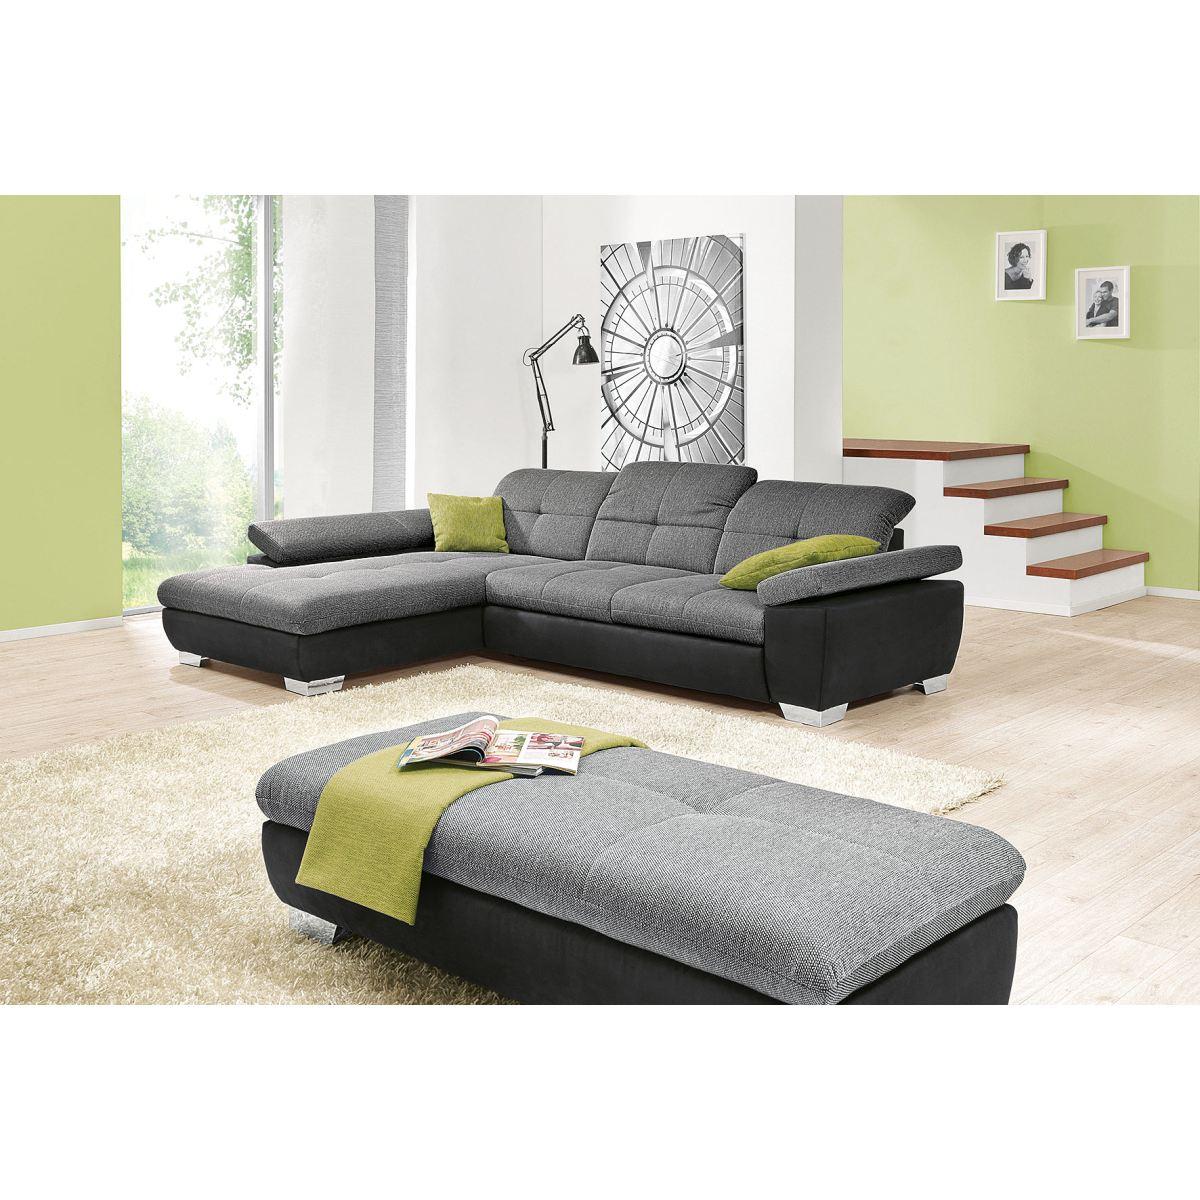 rundecke in anthrazit porta porta onlineshop. Black Bedroom Furniture Sets. Home Design Ideas